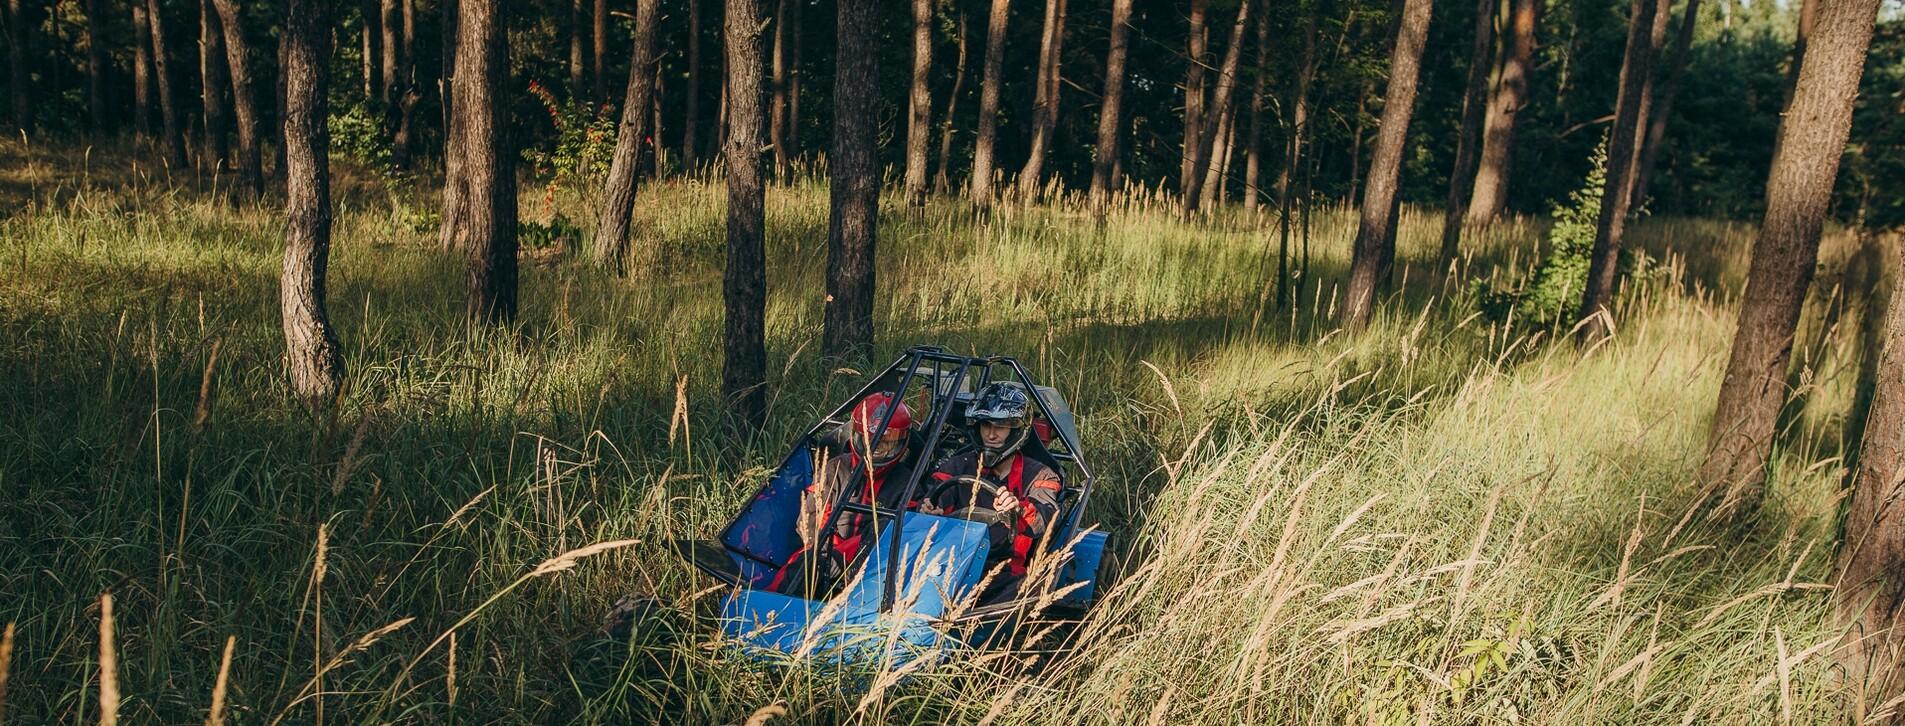 Фото 1 - Заезд на багги по лесу для компании